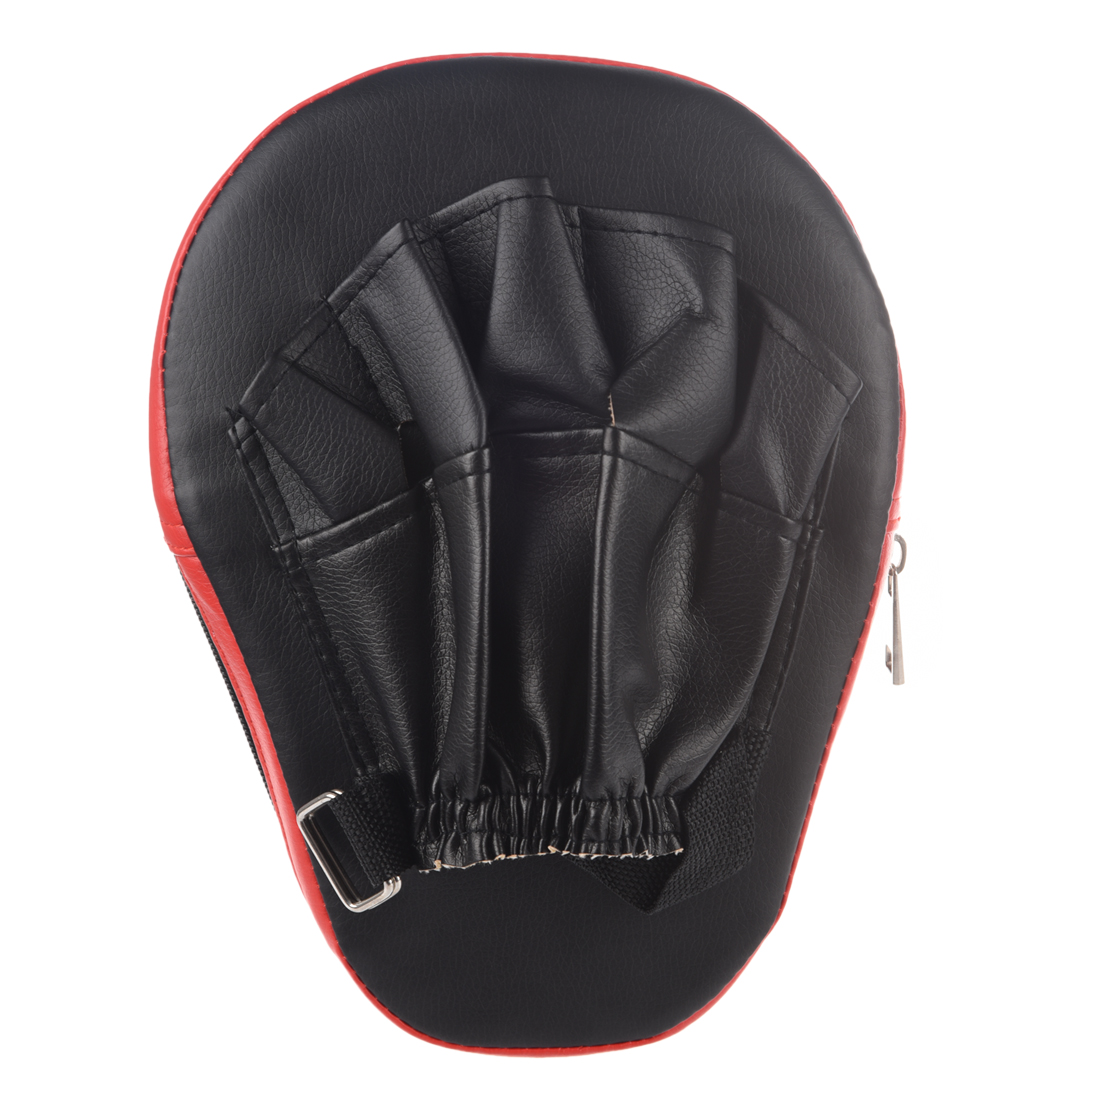 New Sale Focus Gloves Boxing Training Boxing Training Pad & Mittens, Hook and Jab Pad, Kick Pad, Muay Thai Kick Boxing Mixed F